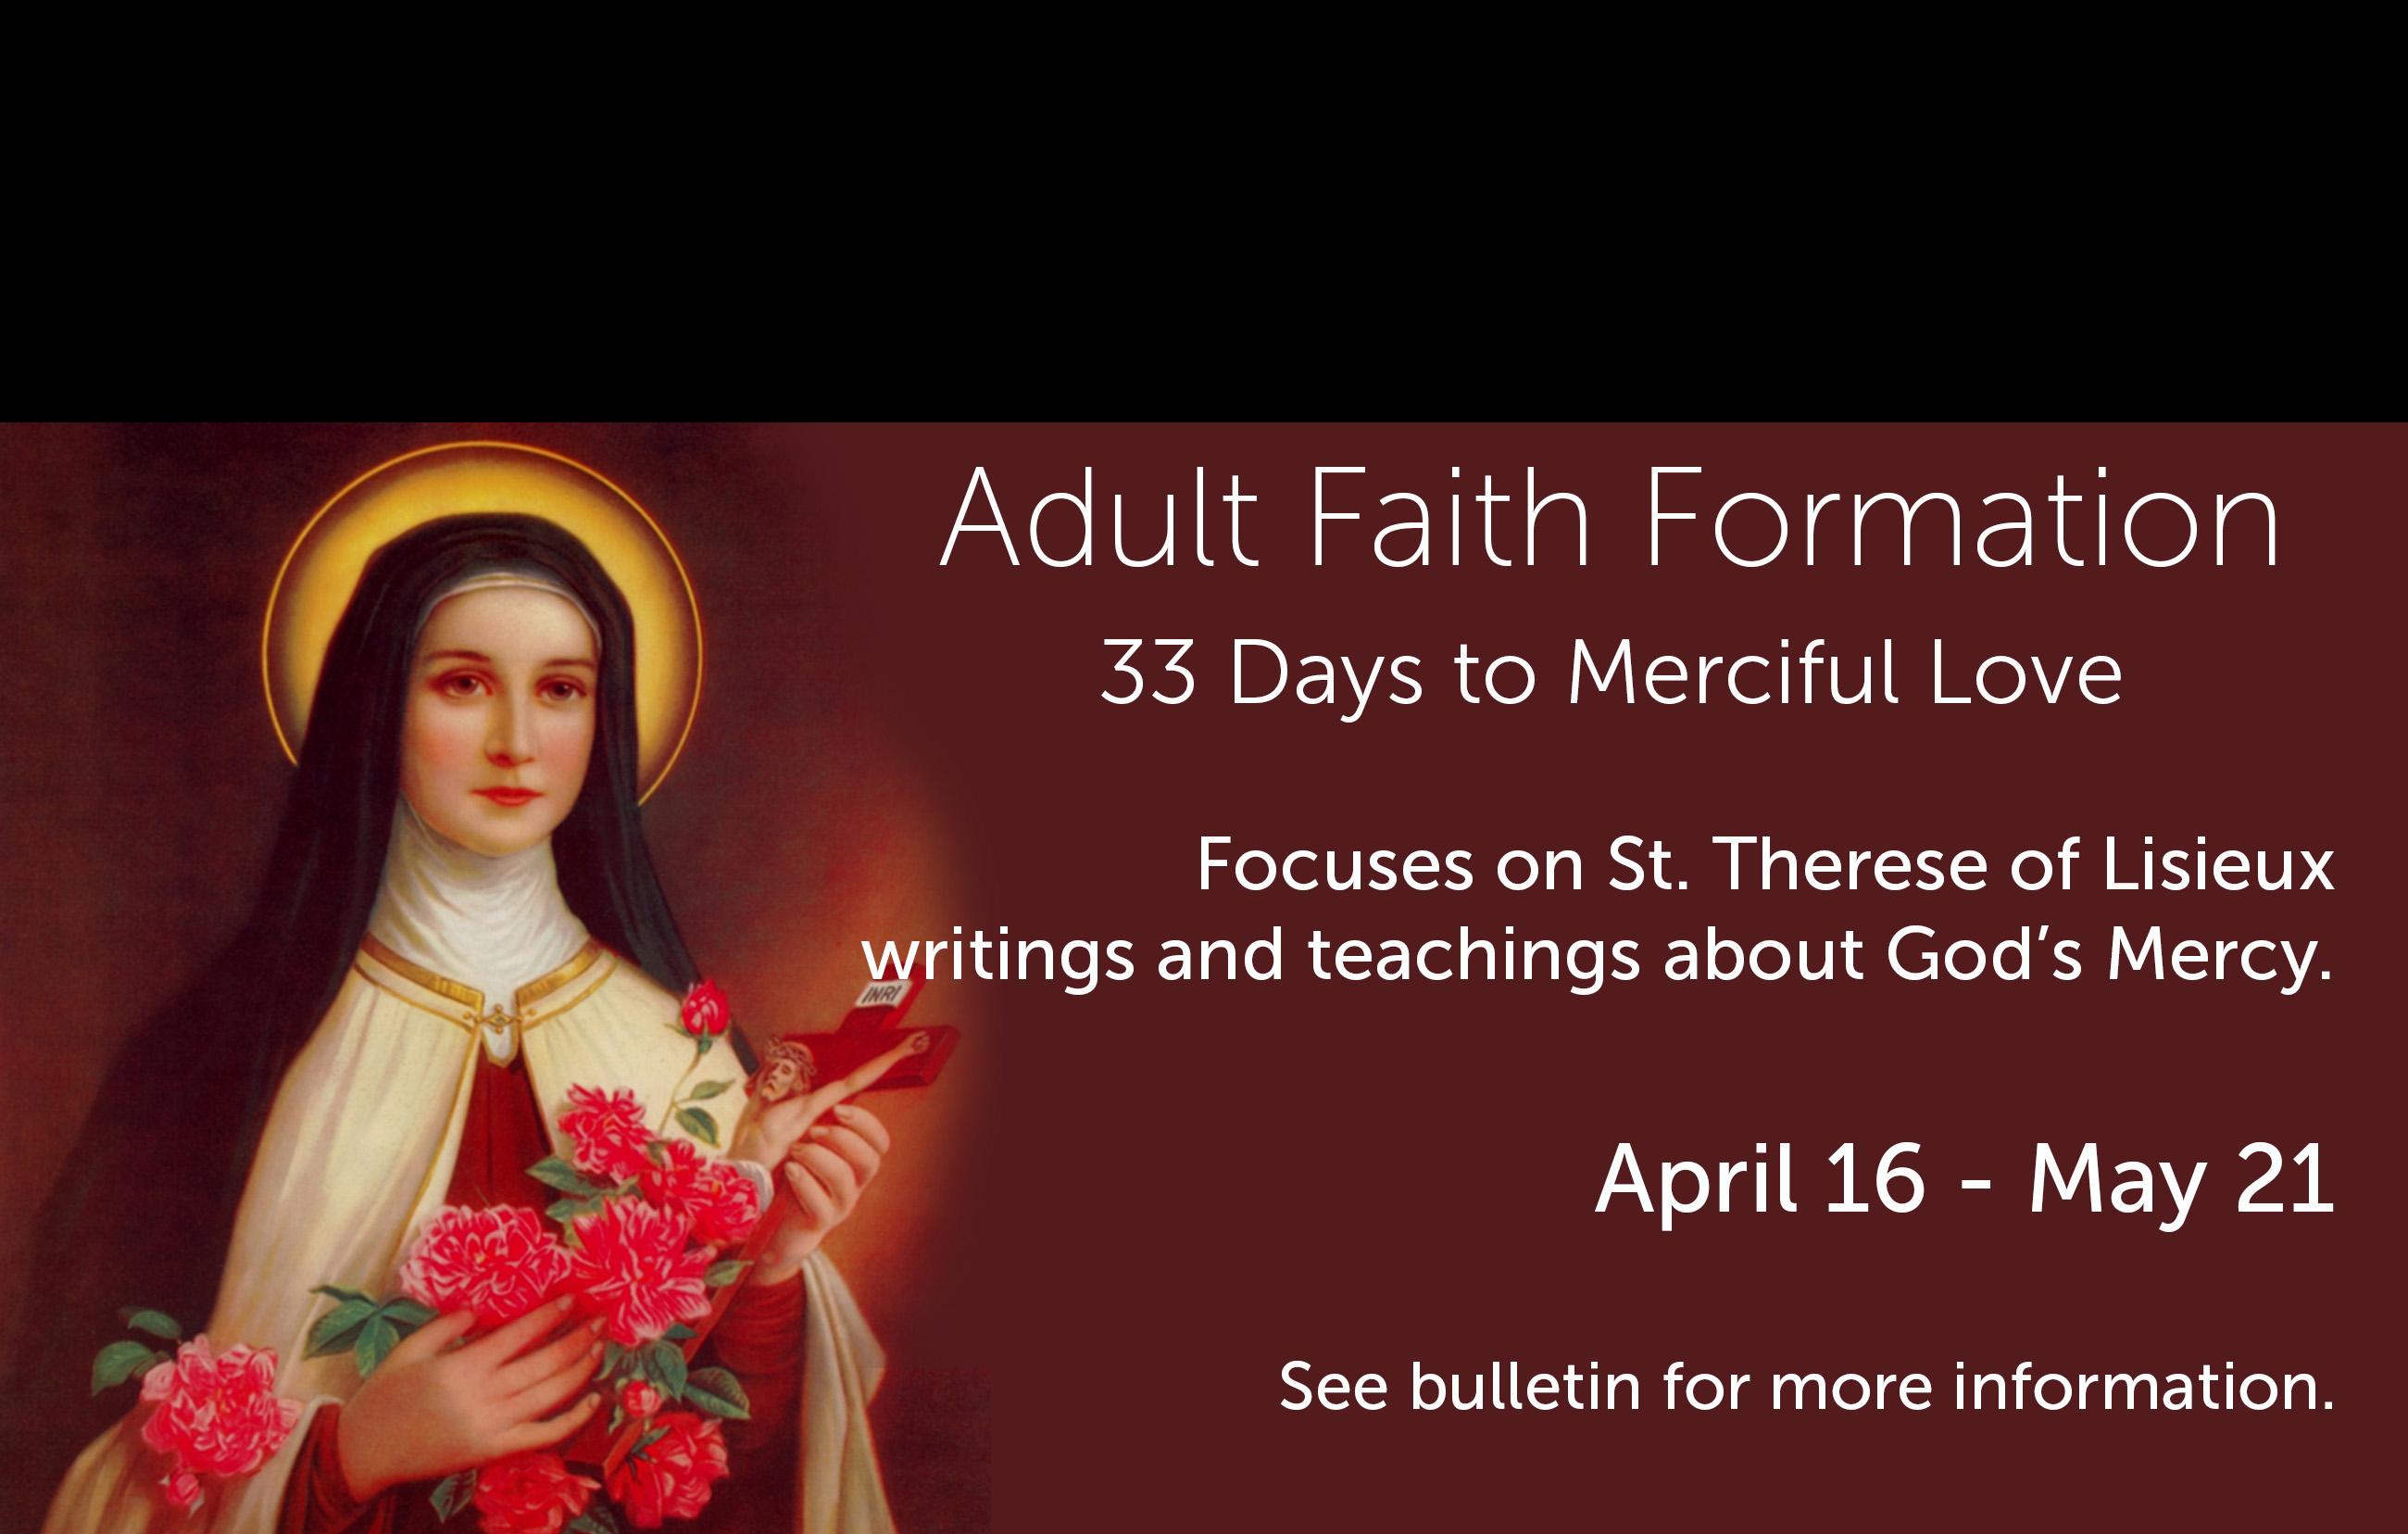 AdultFaithFormation-web